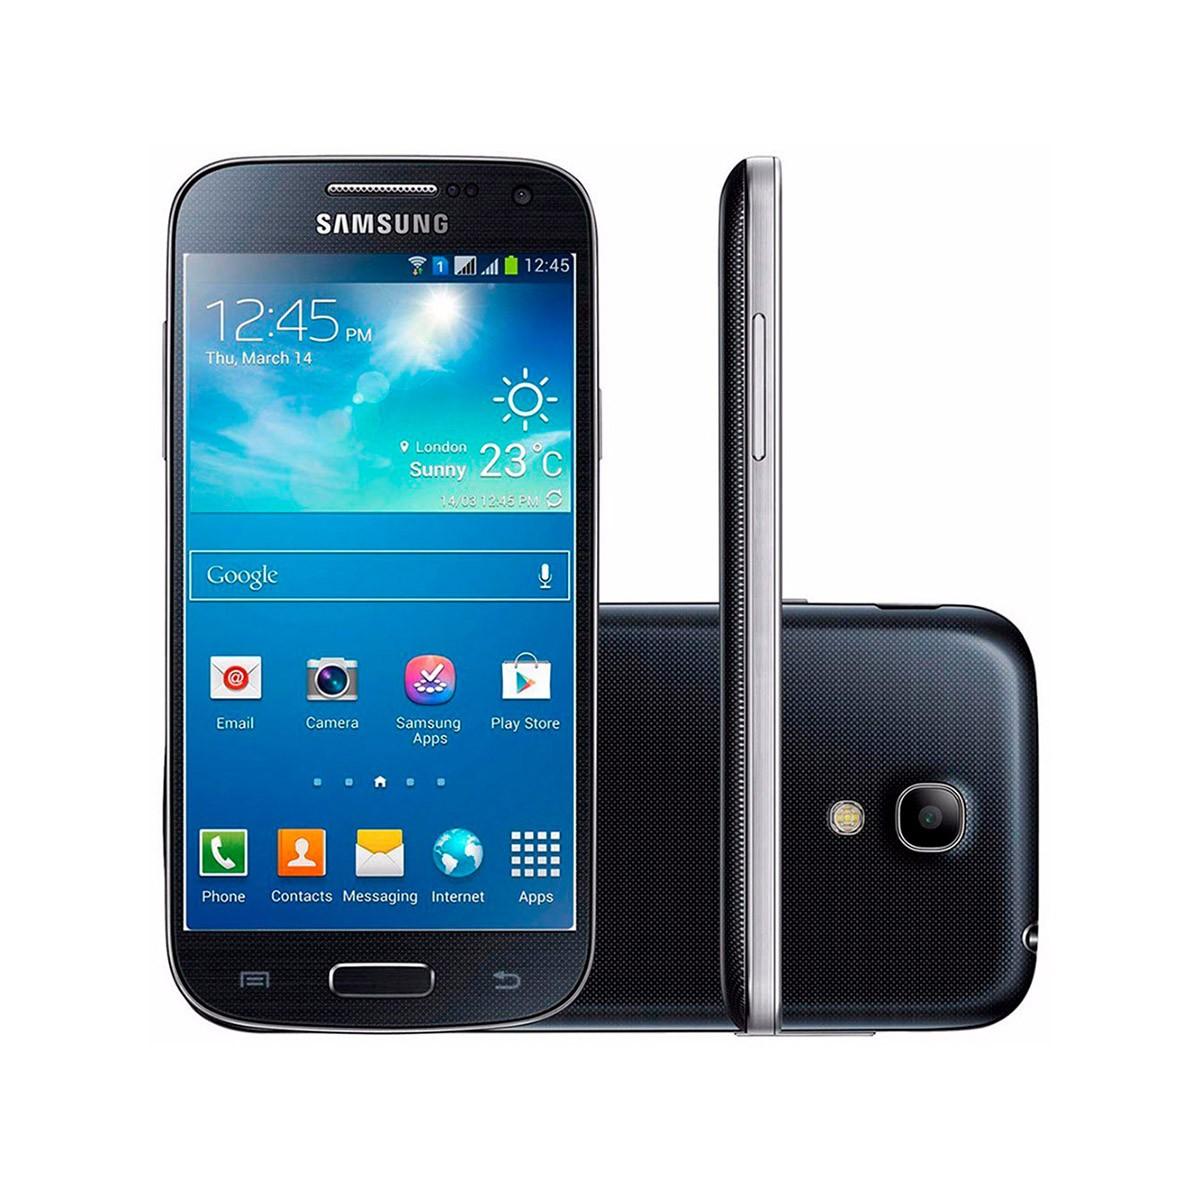 Samsung Galaxy S4 Mini I9195 8GB com Burn-in Leve (Outlet)